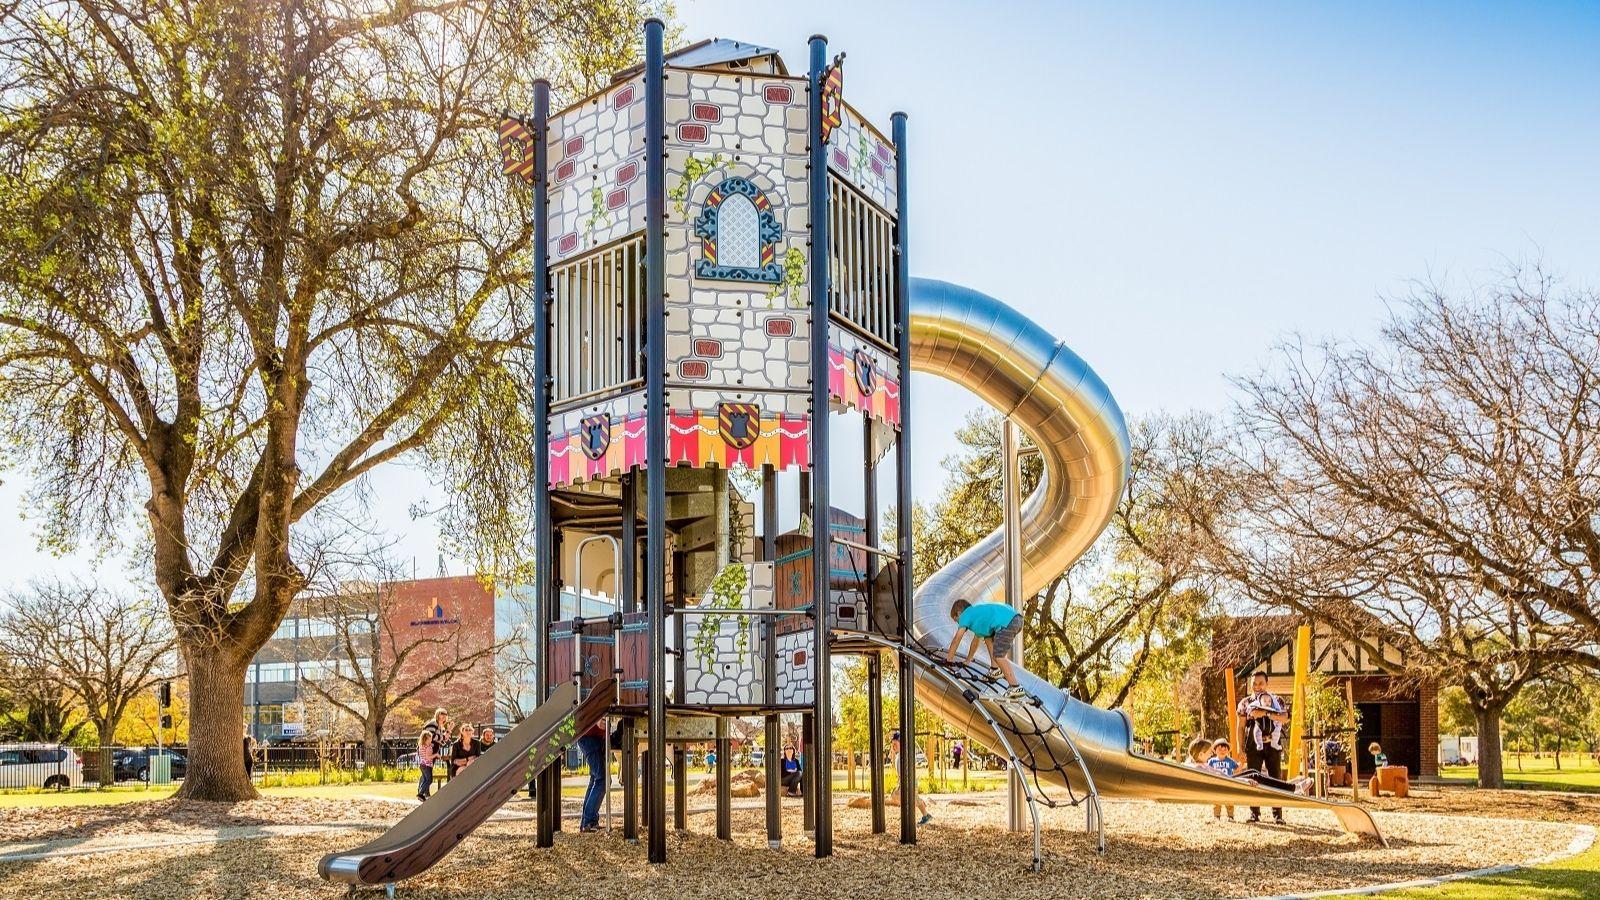 SA - Princess Elizabeth Playground